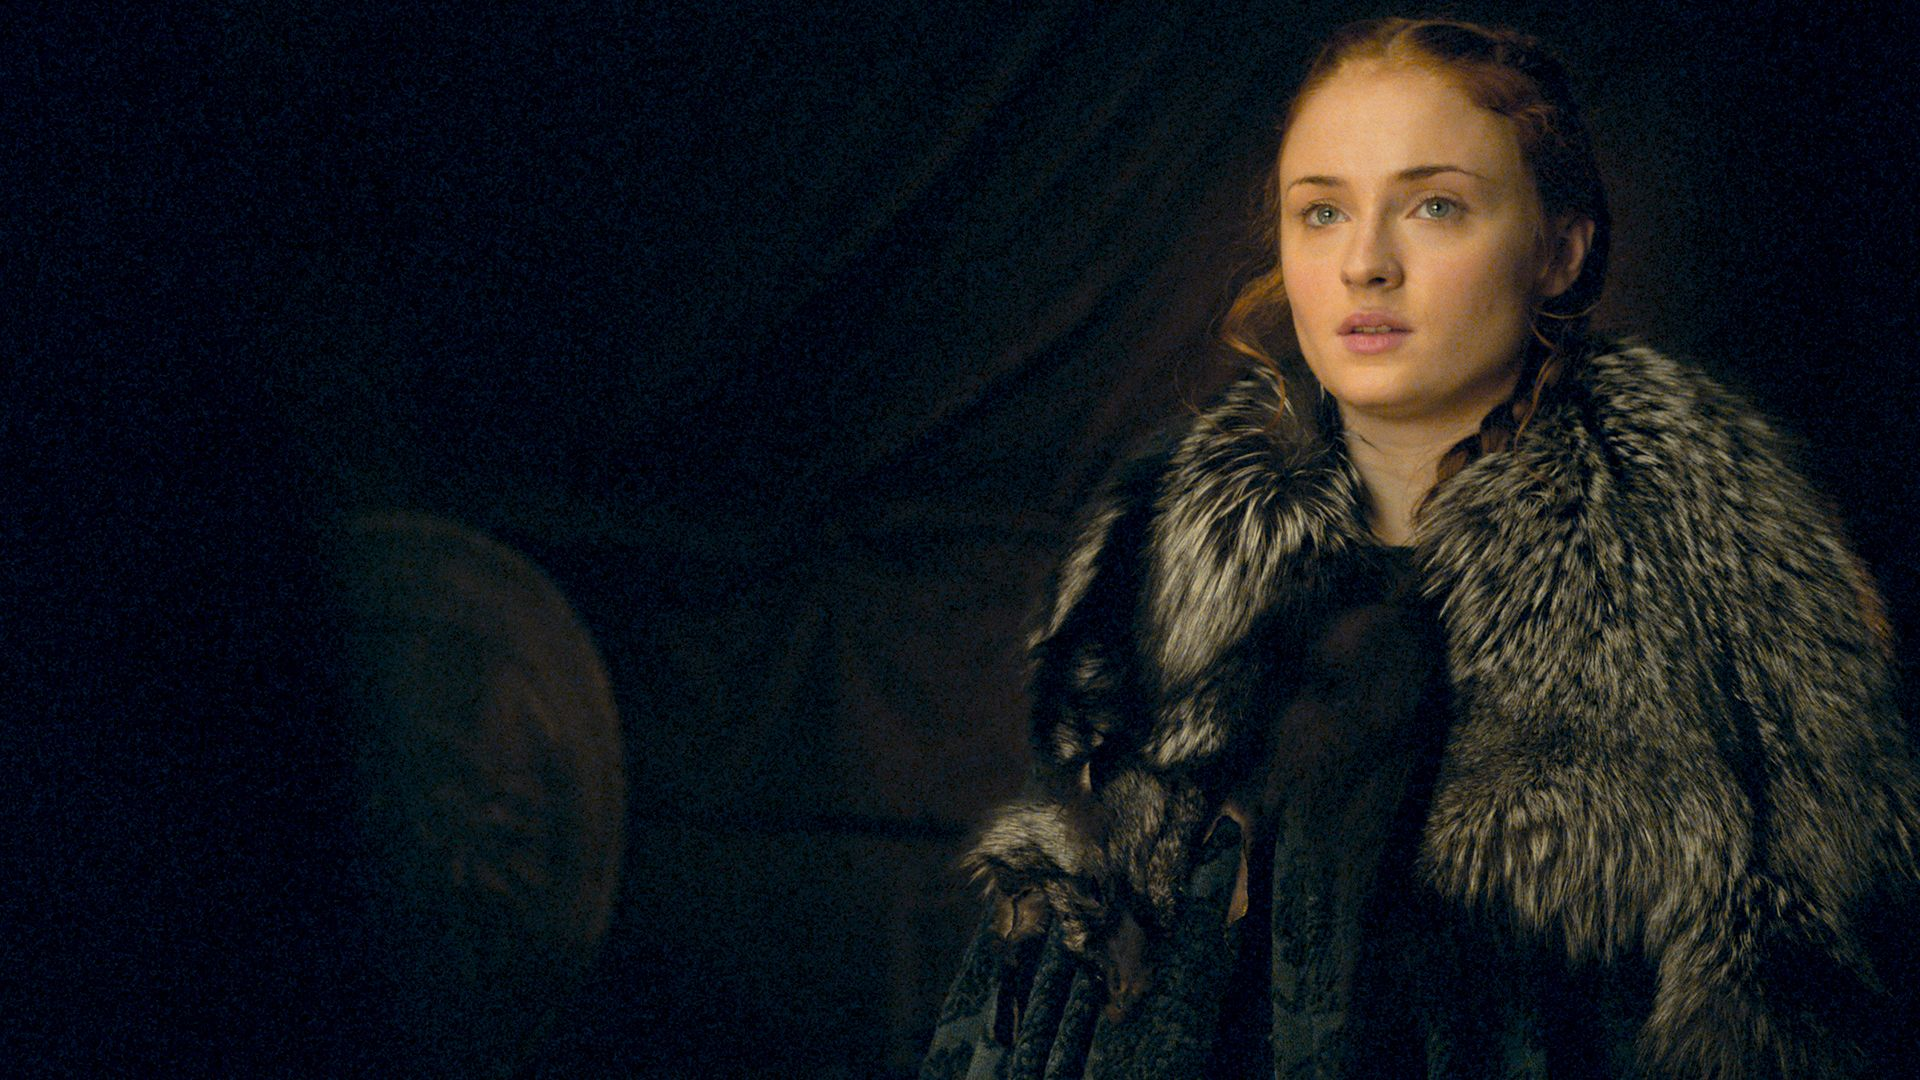 Game Of Thrones' Sophie Turner Reveals Sansa Stark's Fate Beyond Season 8